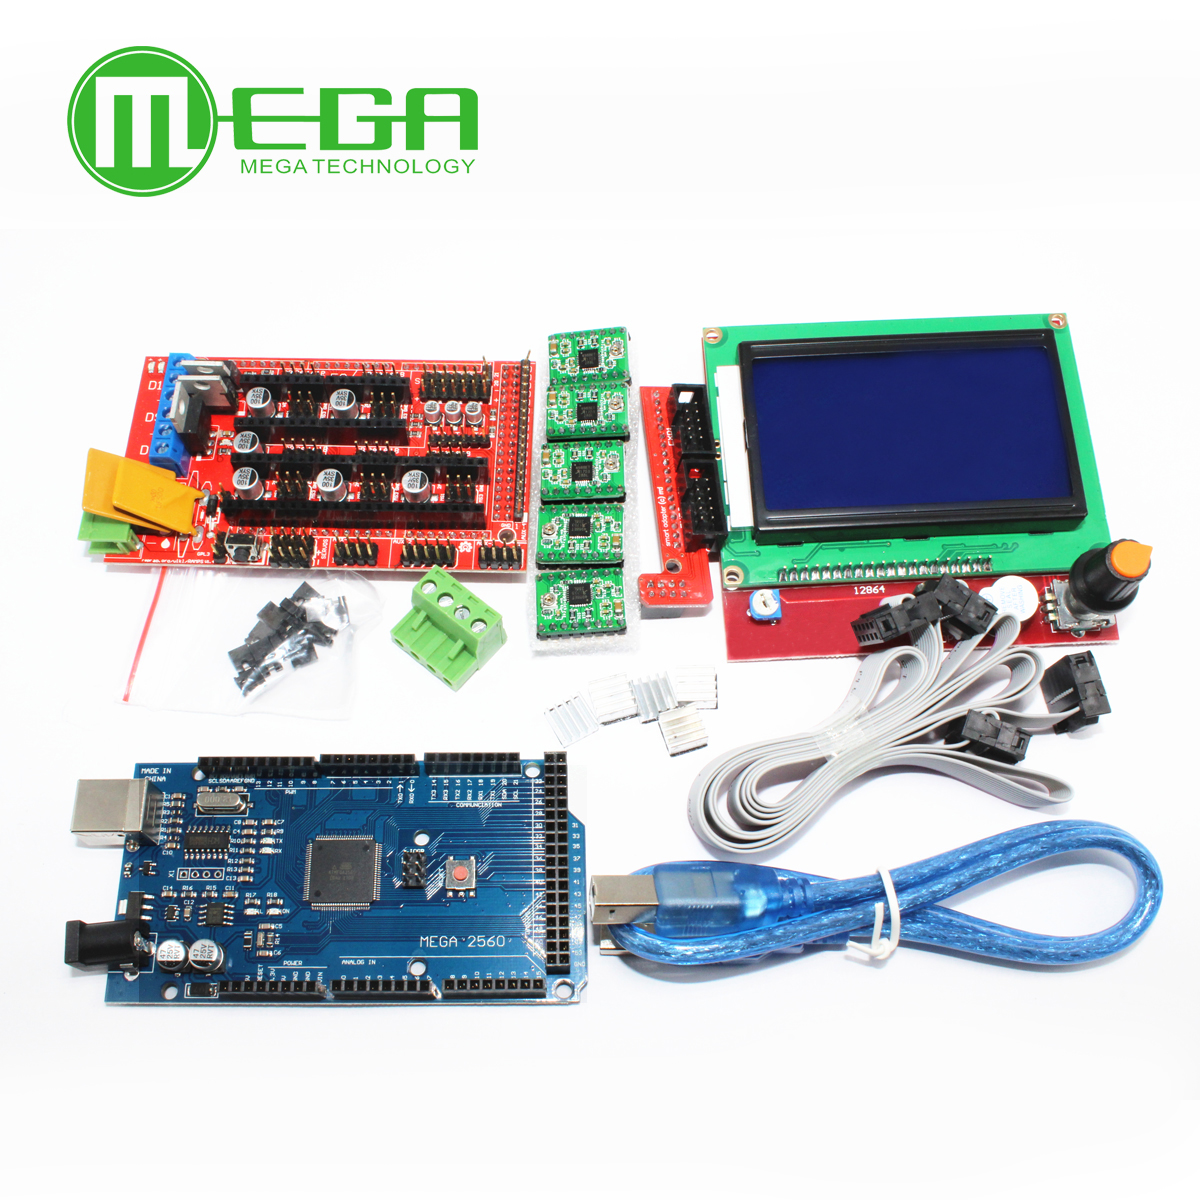 1 unids Mega 2560 R3 CH340 + 1 unids rampas 1,4 controlador + 5 unids A4988 paso a paso módulo + 1 unids 12864 controlador para 3D kit de impresora